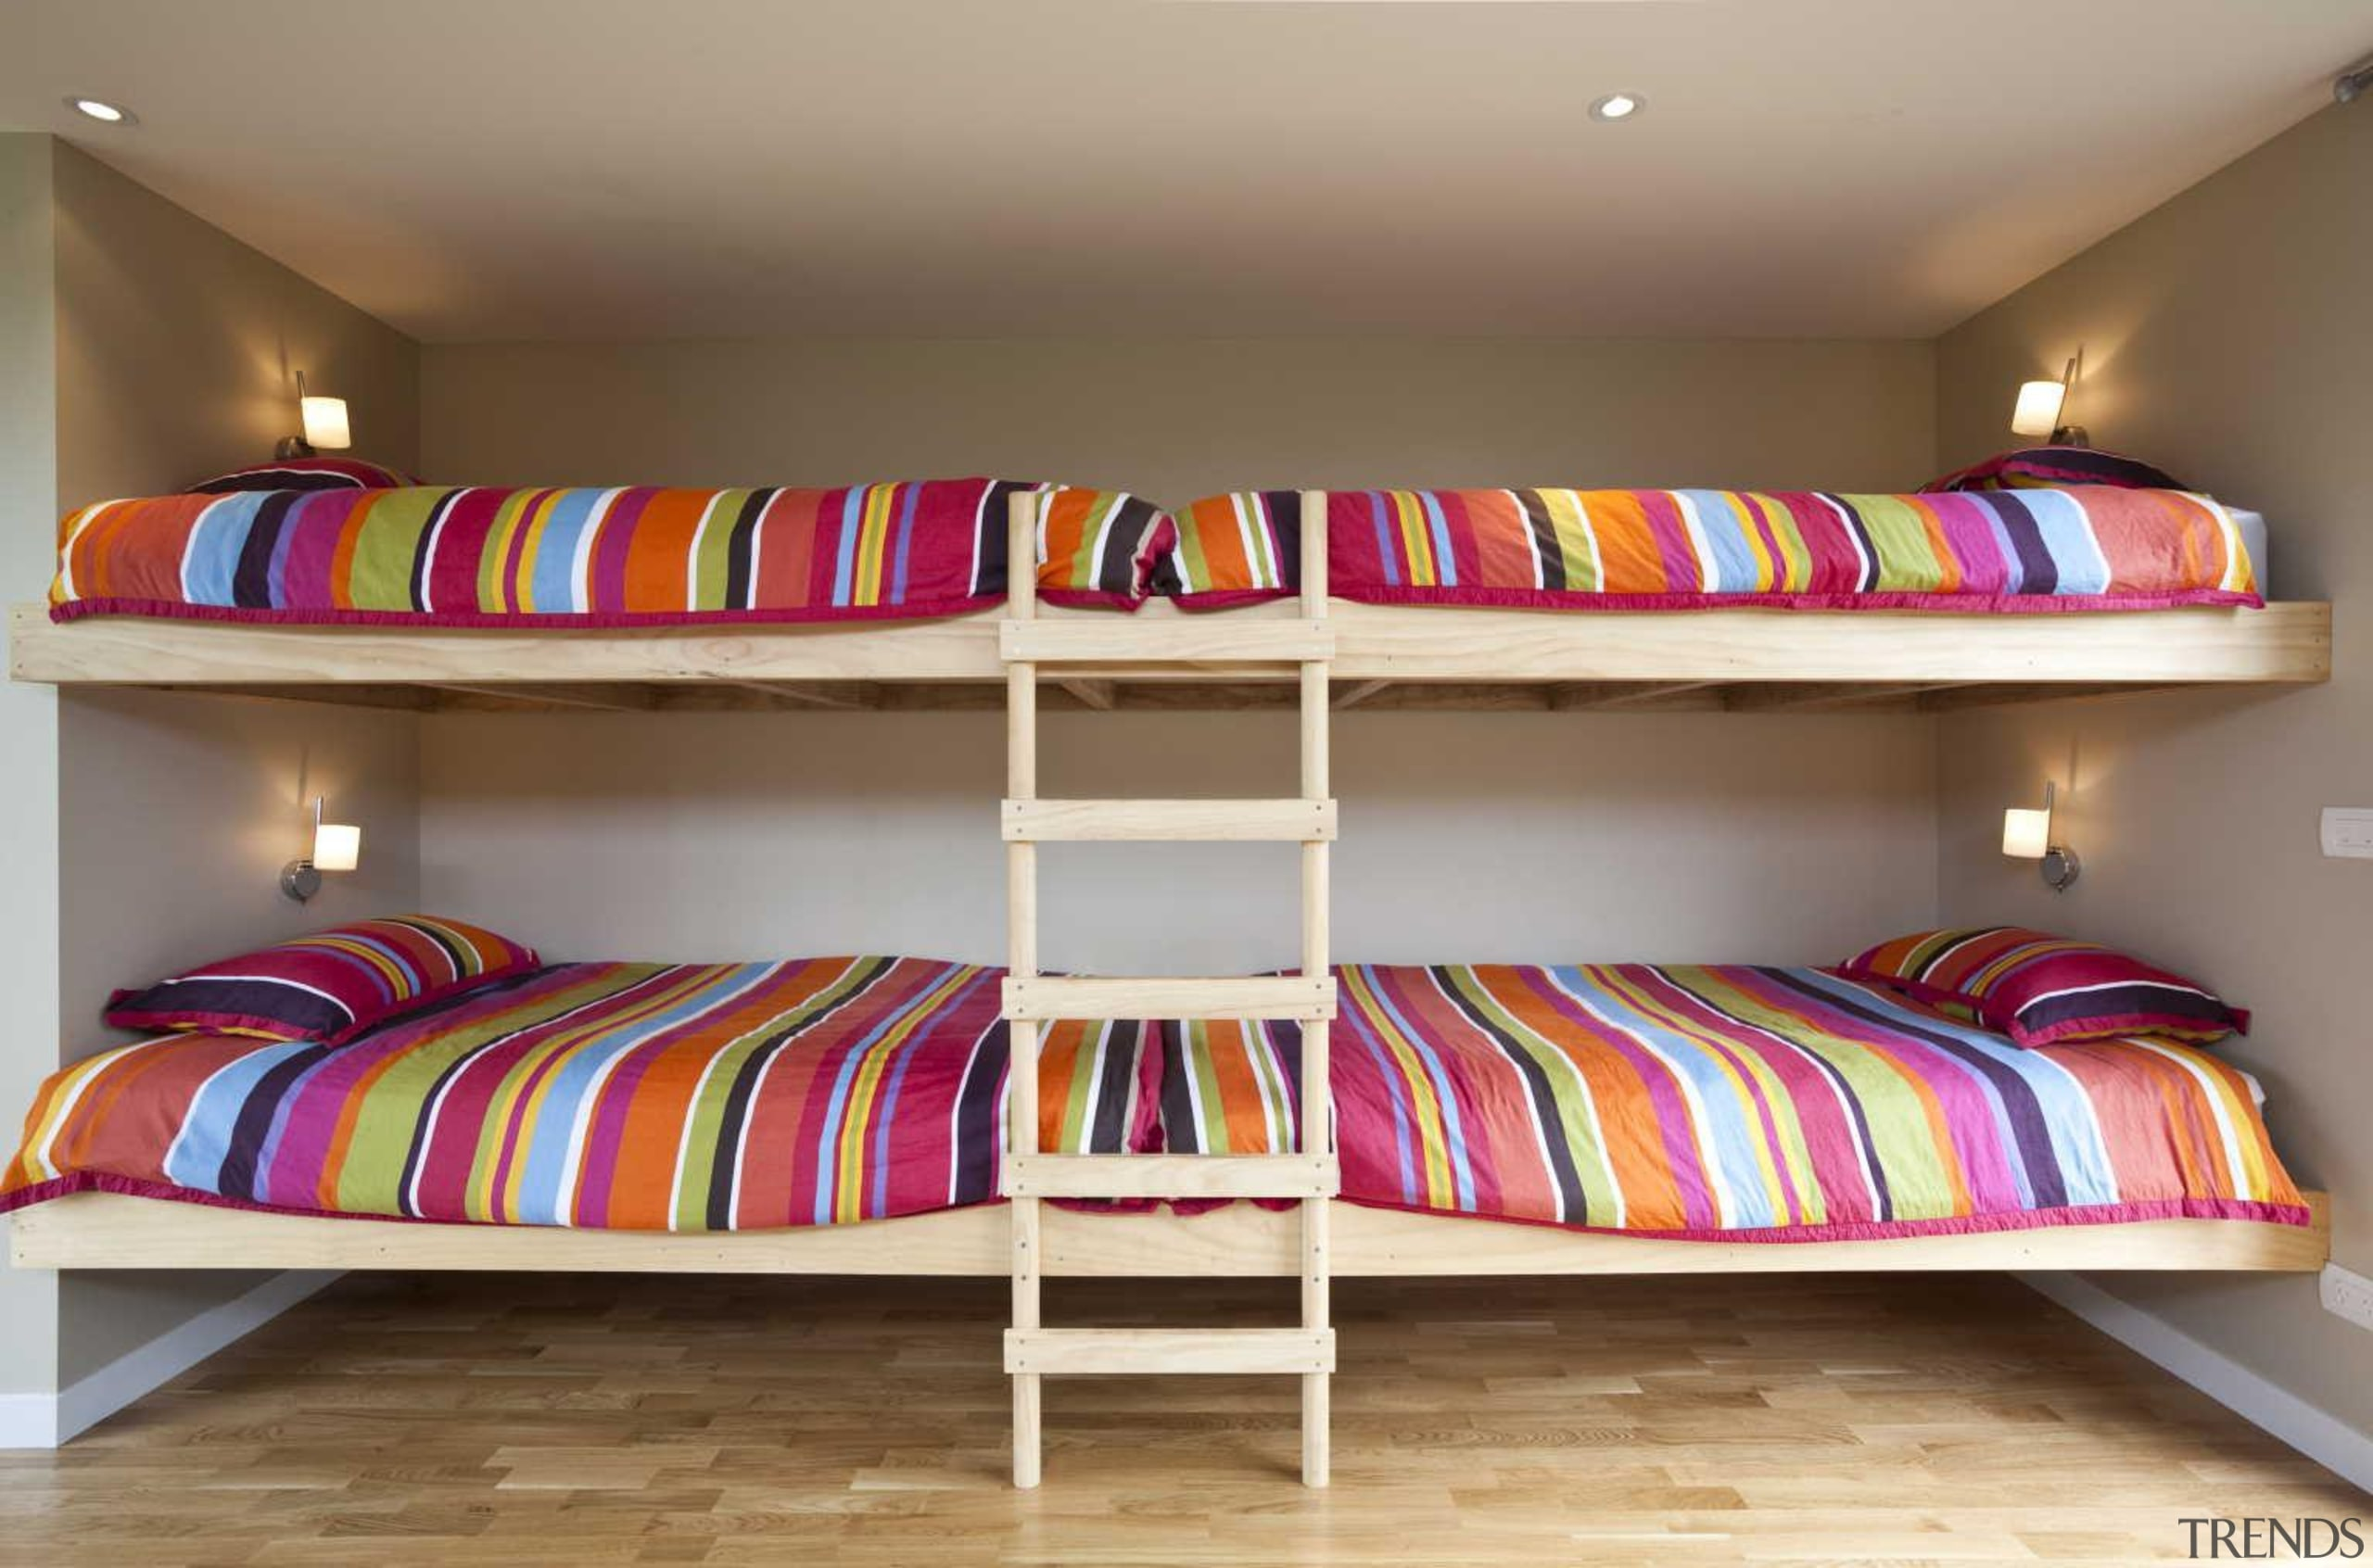 Bed bunk bedroom timber - Bed bunk - bed, bed frame, bedroom, bunk bed, furniture, interior design, product, room, brown, gray